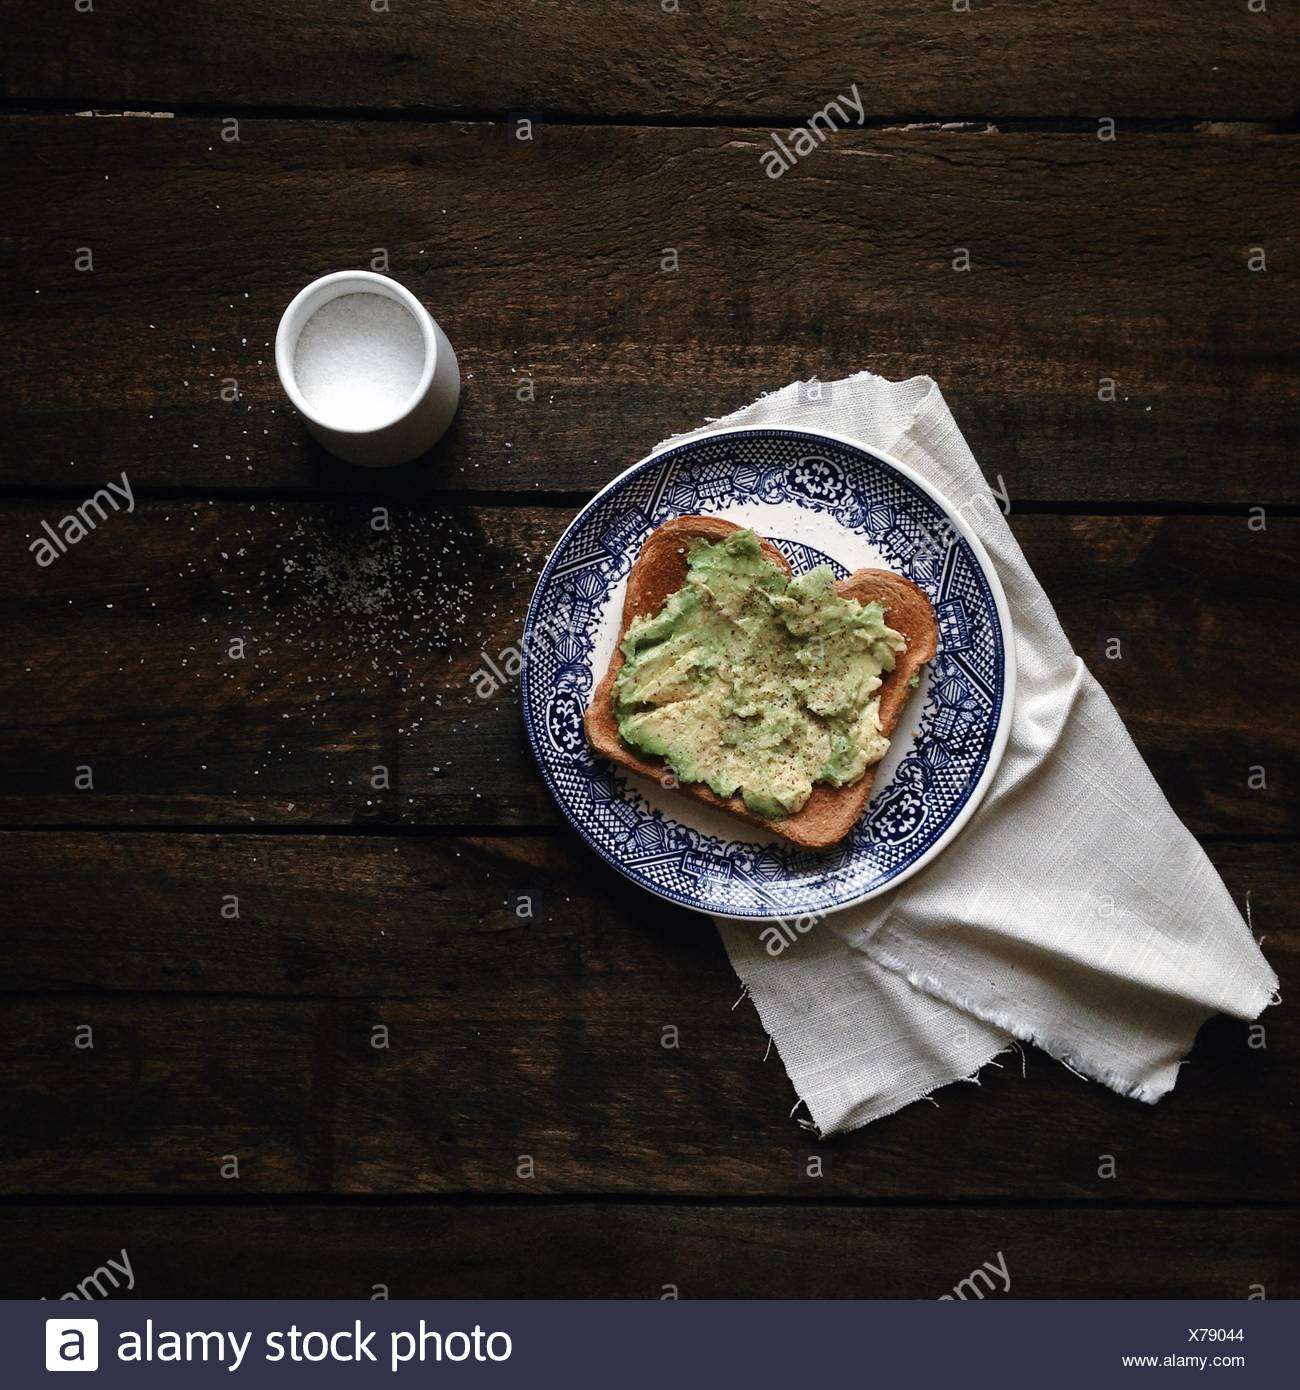 Avocado on toast with salt - Stock Image